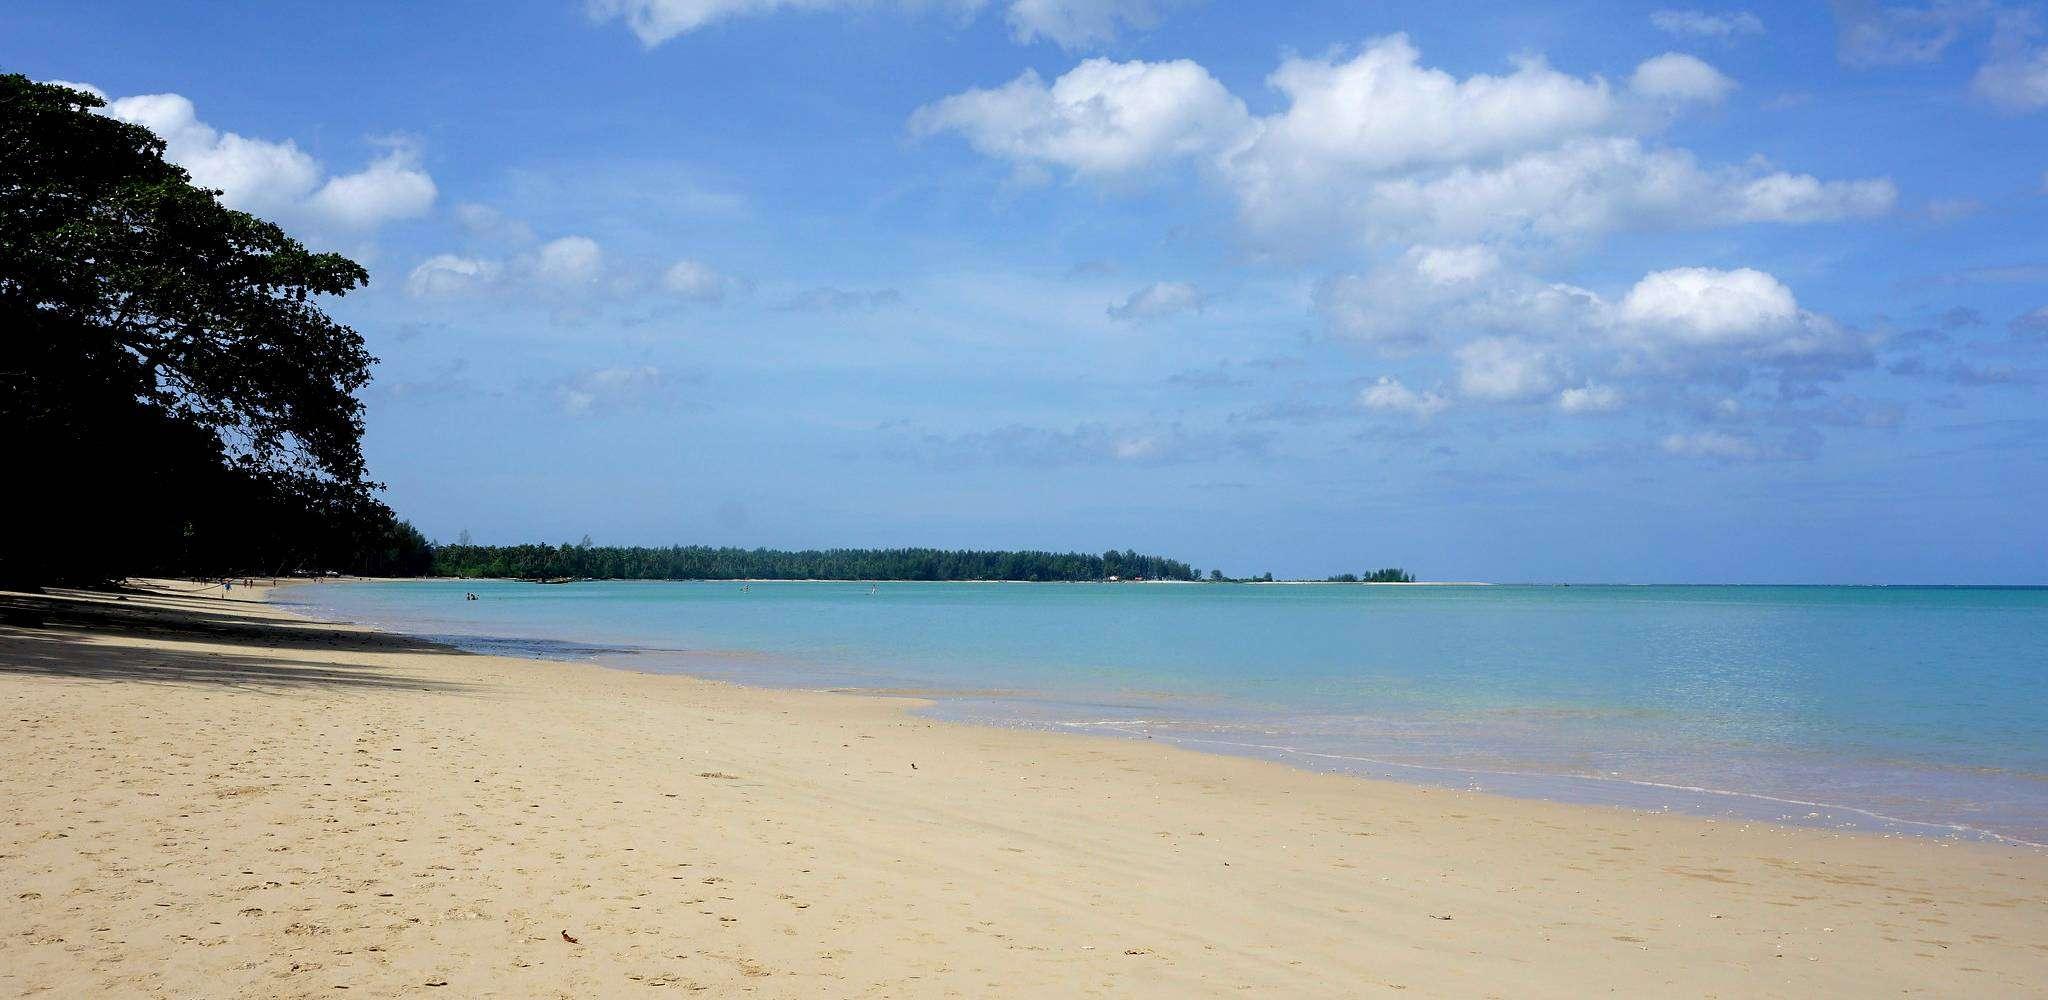 White Sand Beach en Coconut Beach, langerekt wit strand met blauwe zee